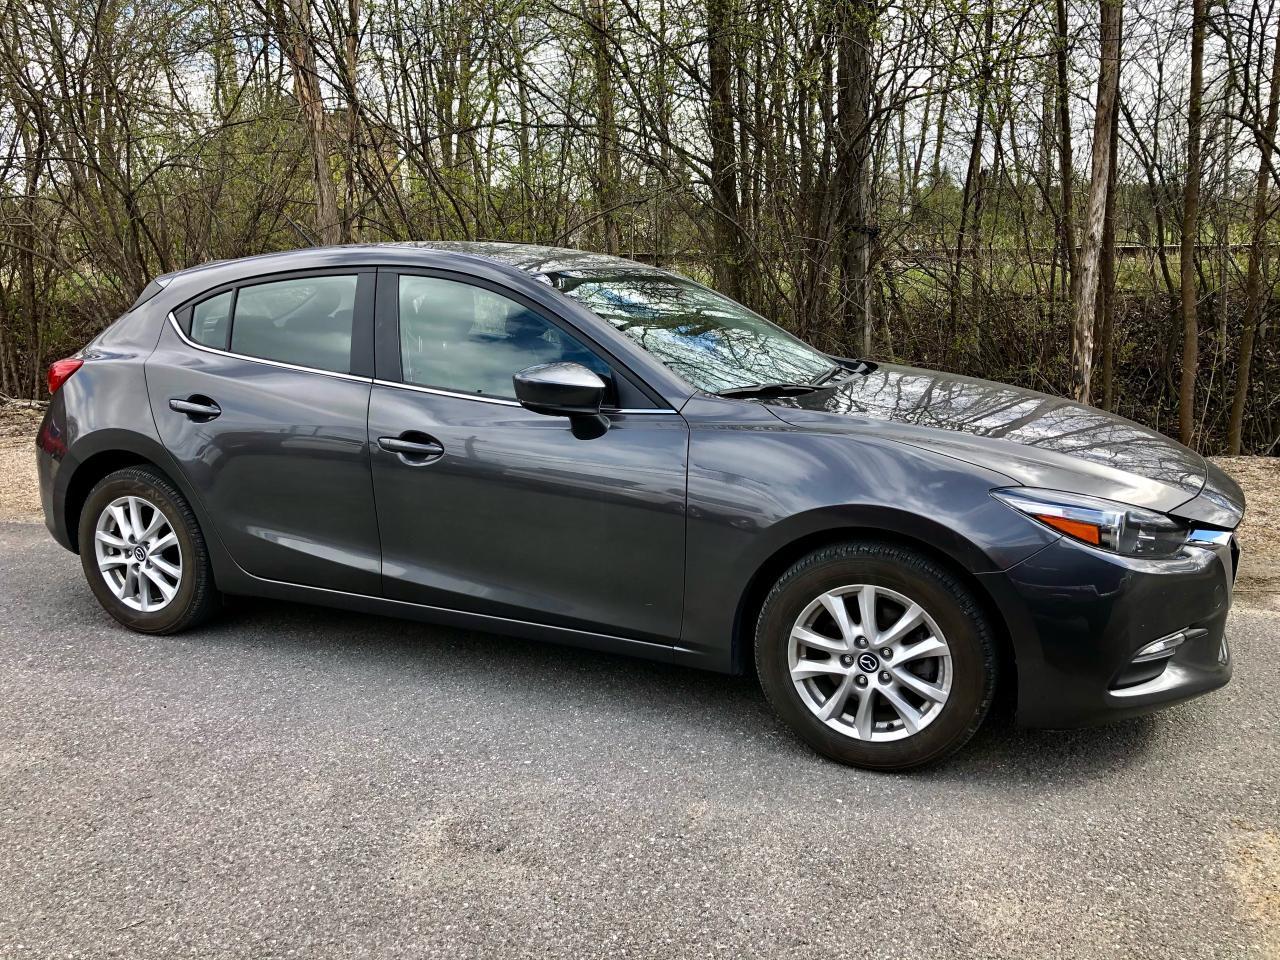 2018 Mazda MAZDA3 GS Only 66000 km $59 Weekly